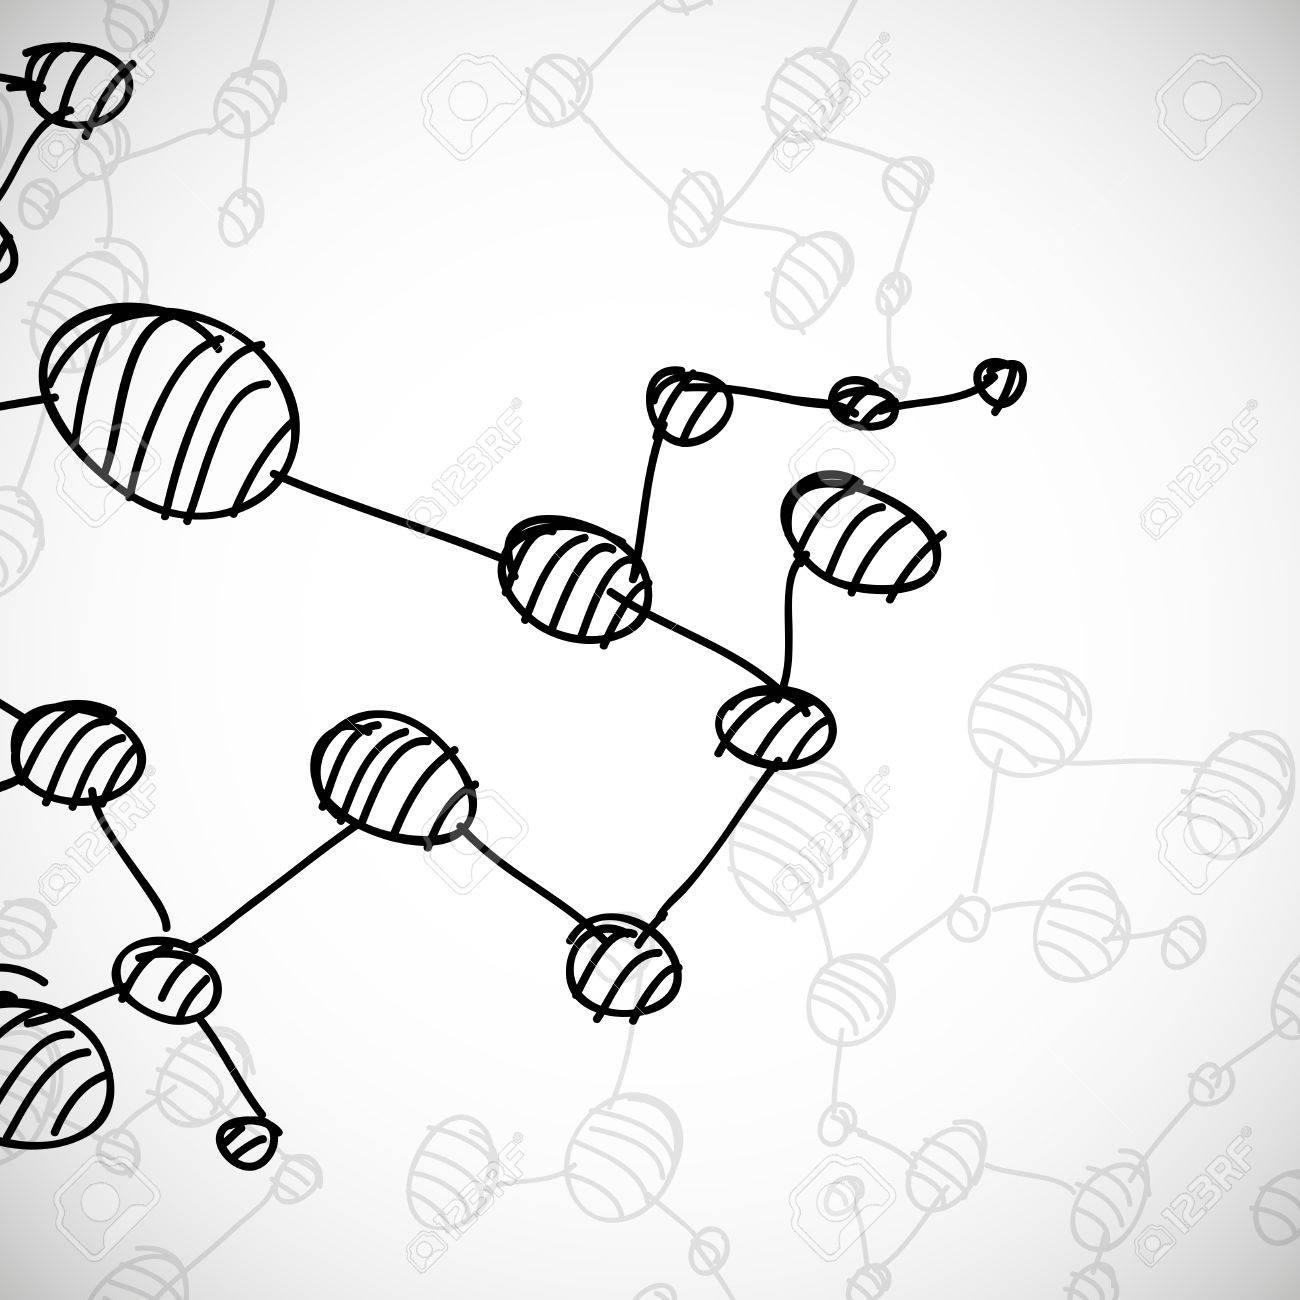 hand drawn DNA molecule Stock Vector - 24017194